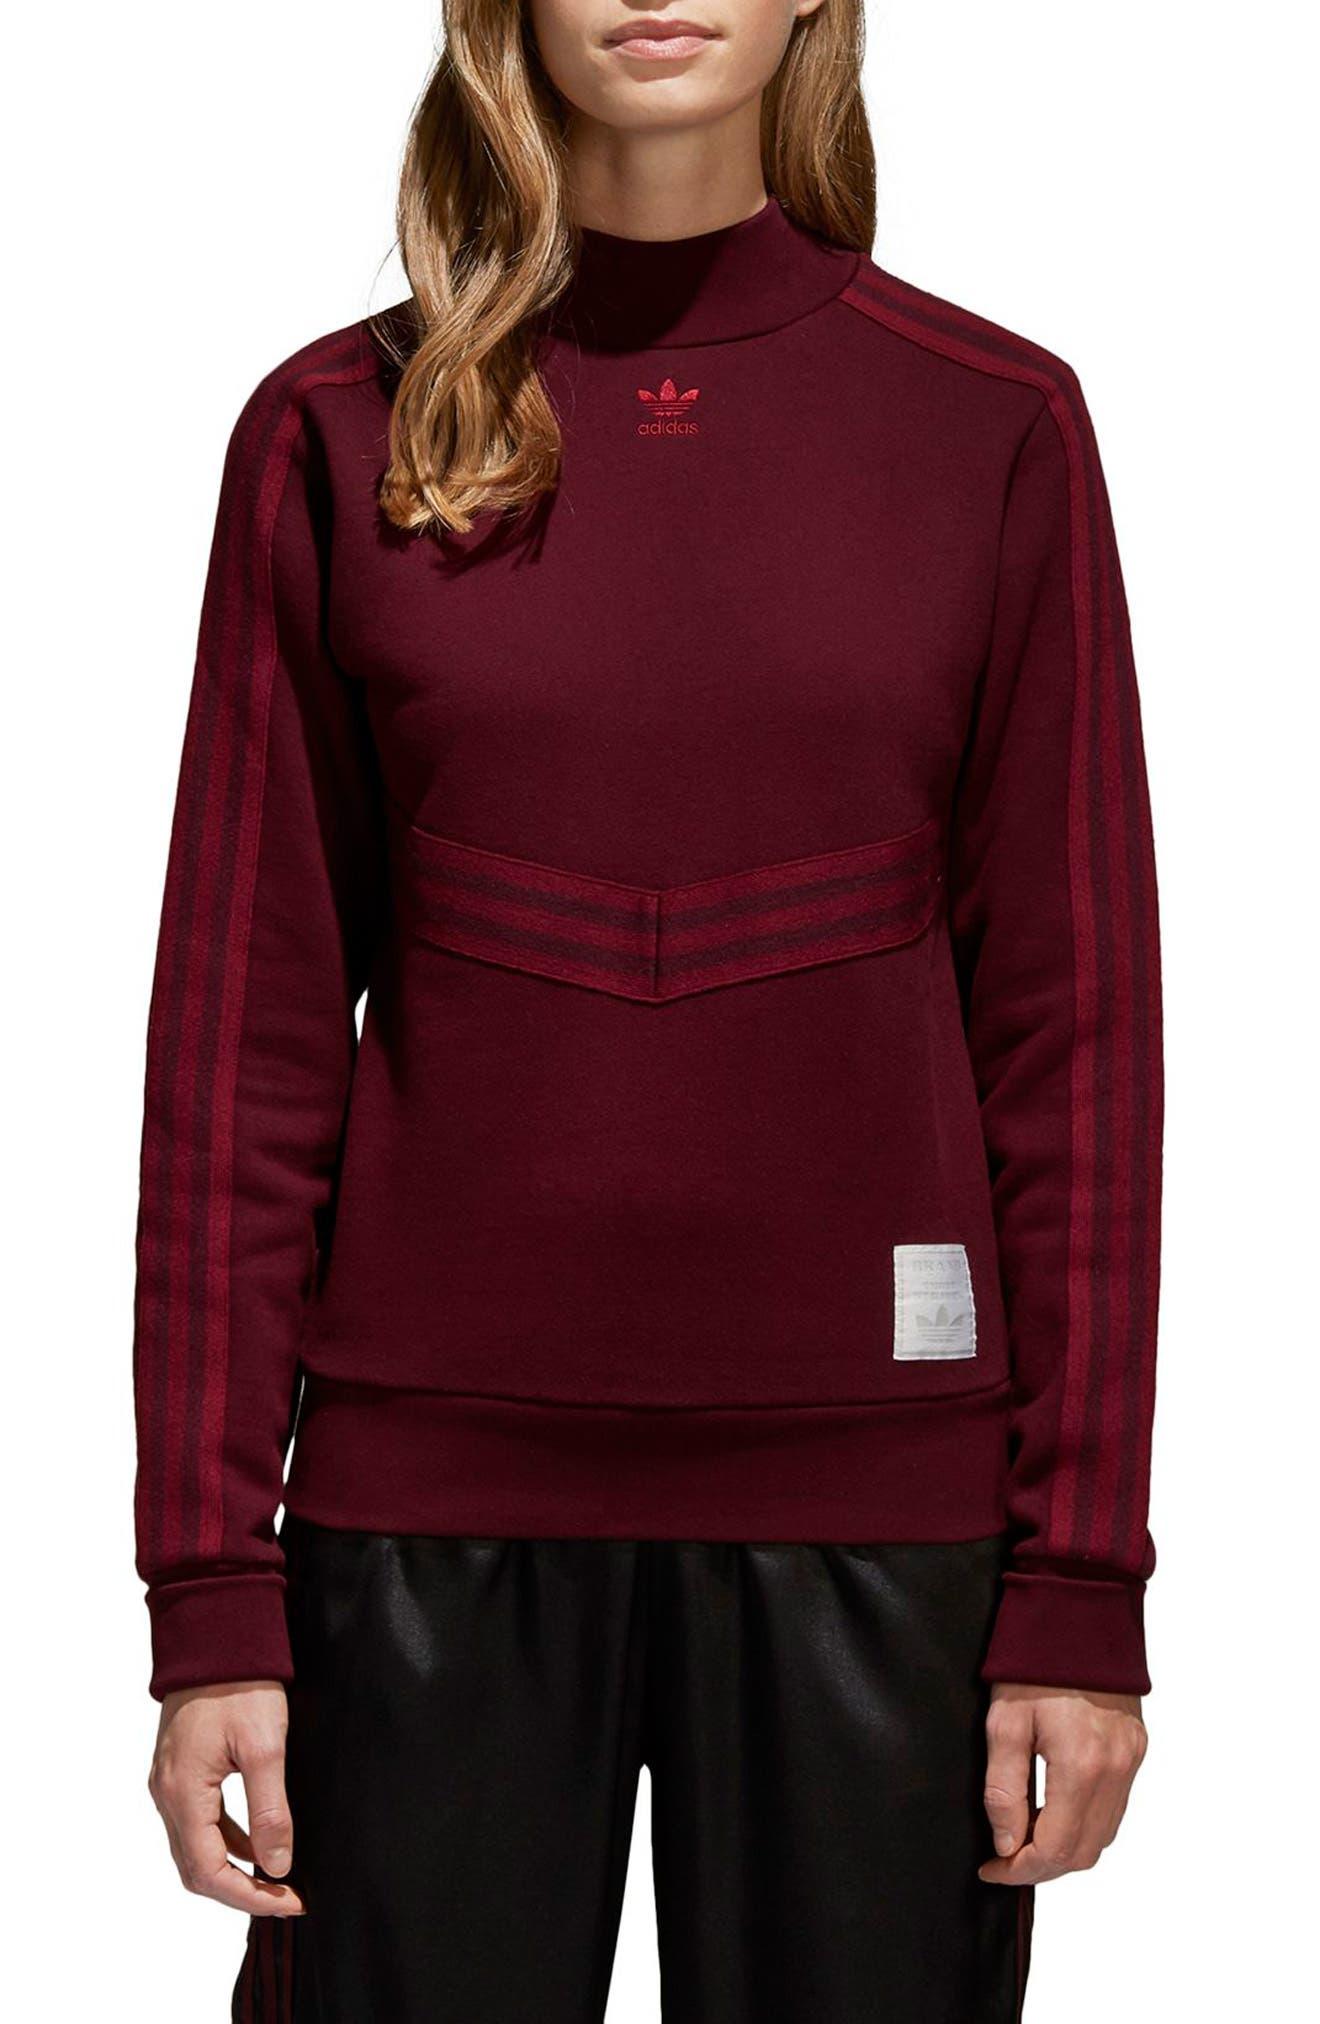 adidas Originals Adibreak Sweatshirt